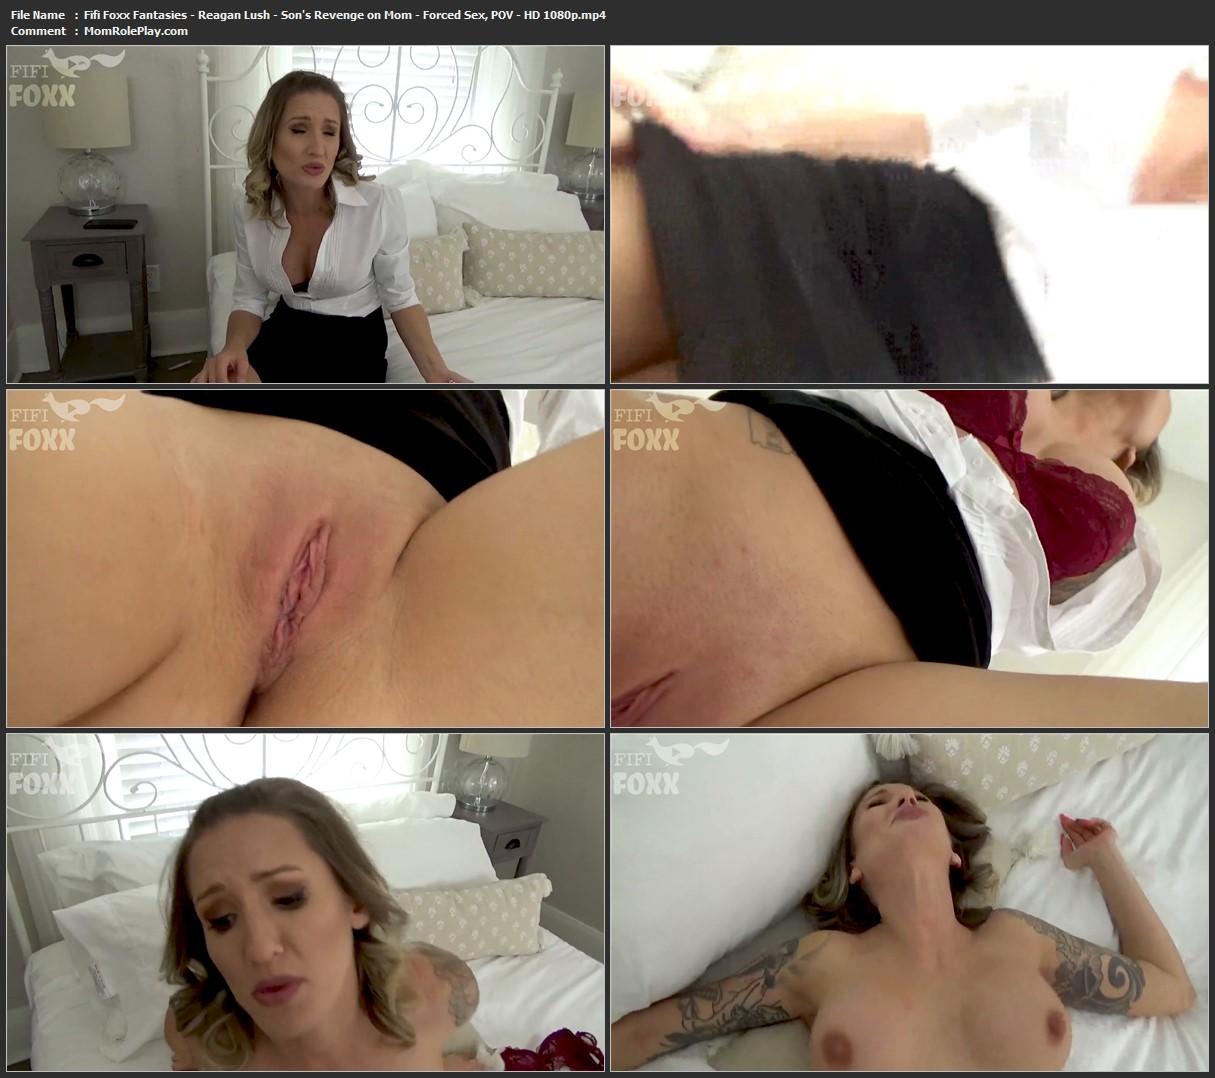 Fifi Foxx Fantasies - Reagan Lush - Son's Revenge on Mom - Forced Sex, POV - HD 1080p